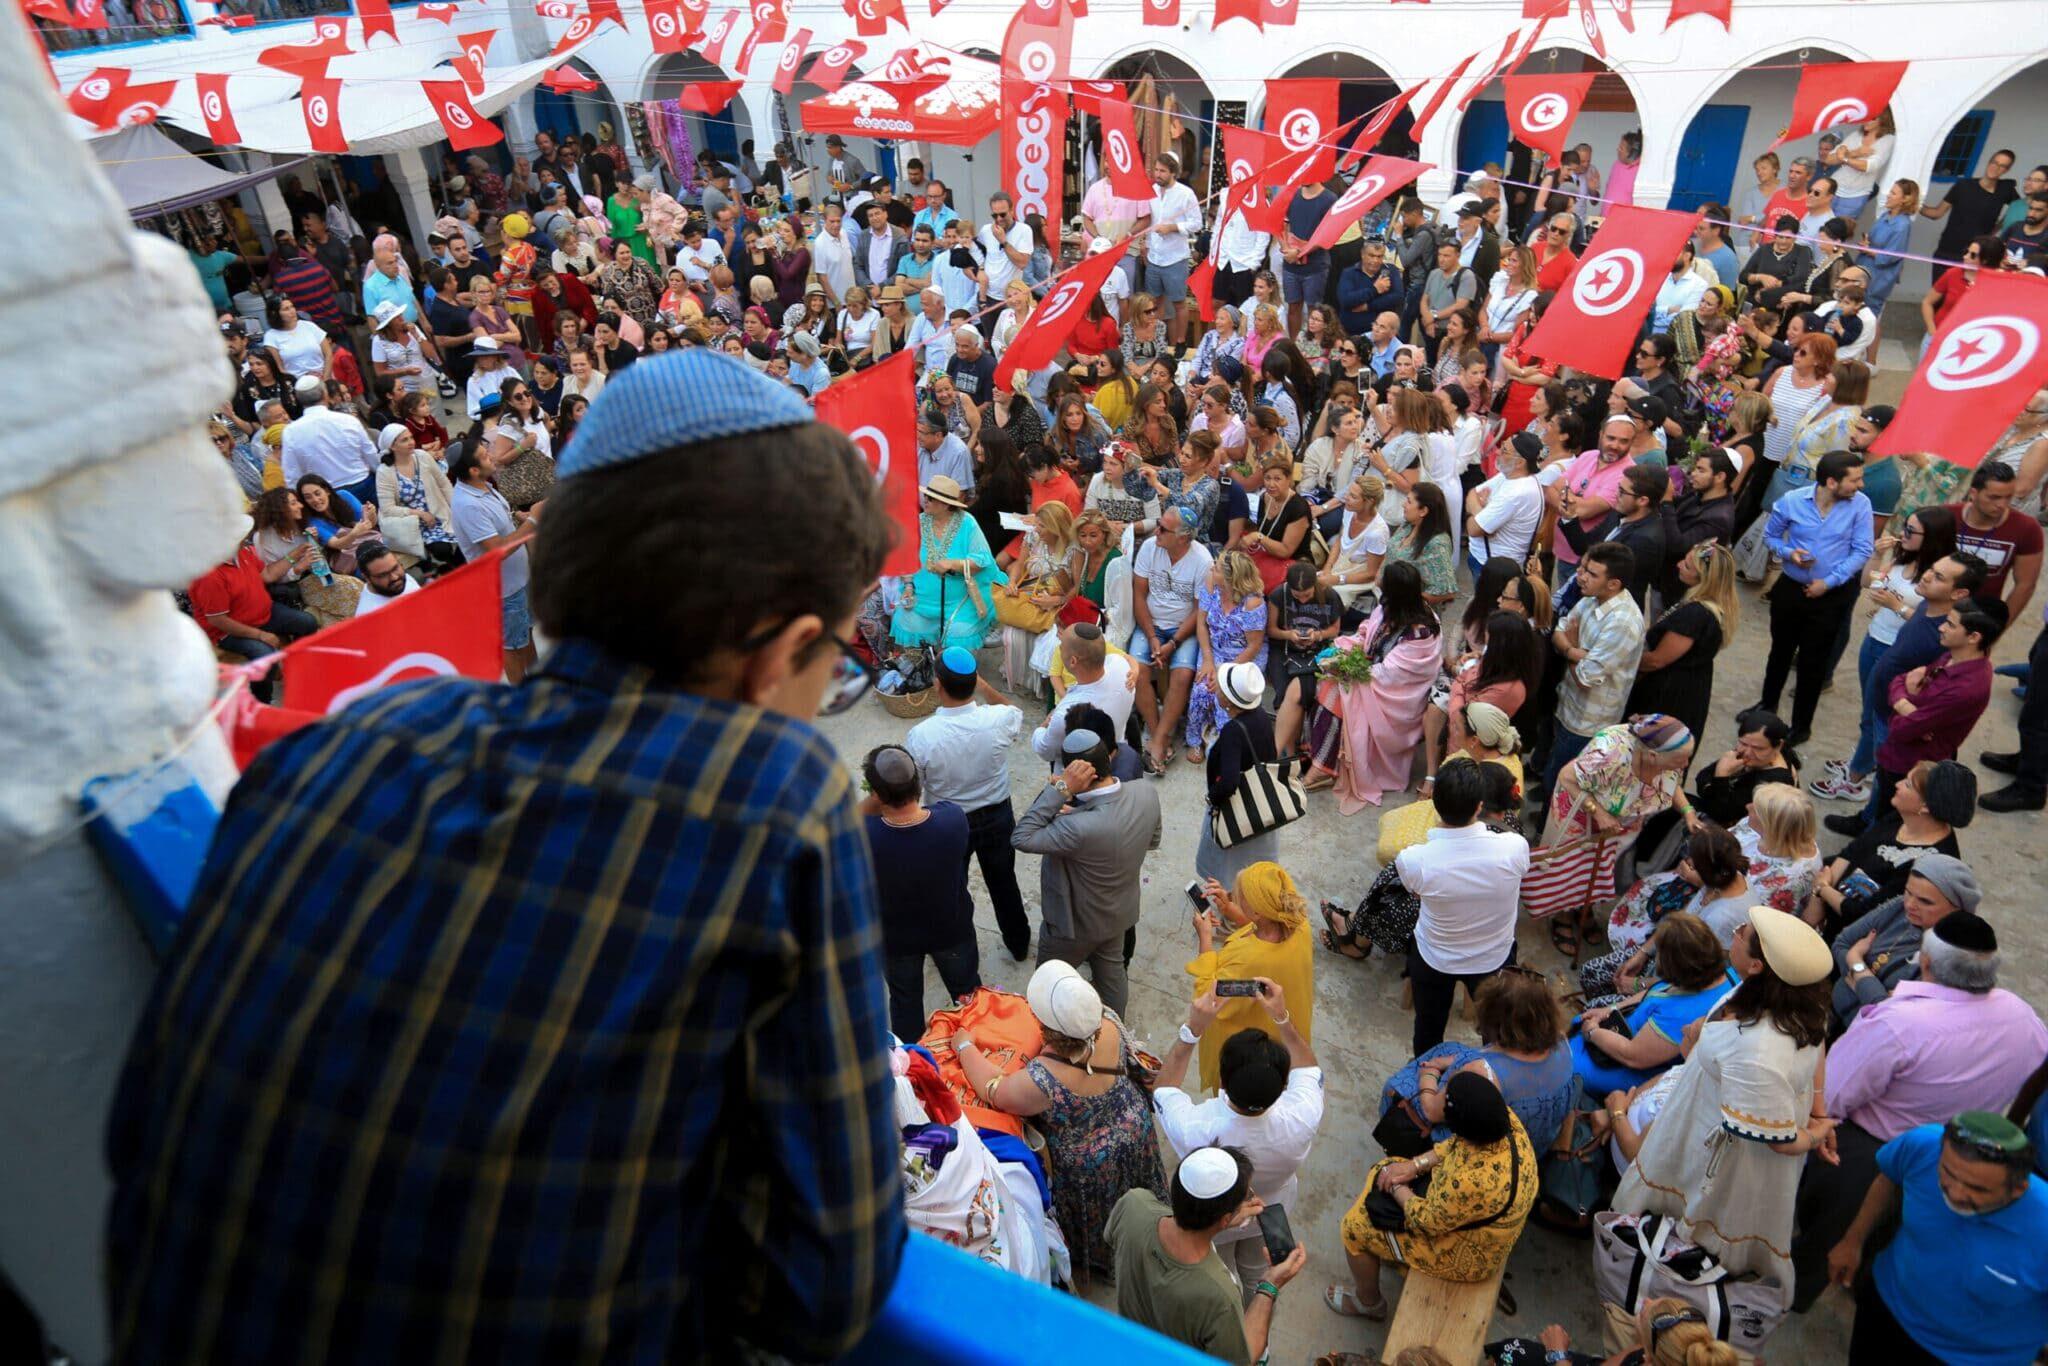 Population of Tunisia